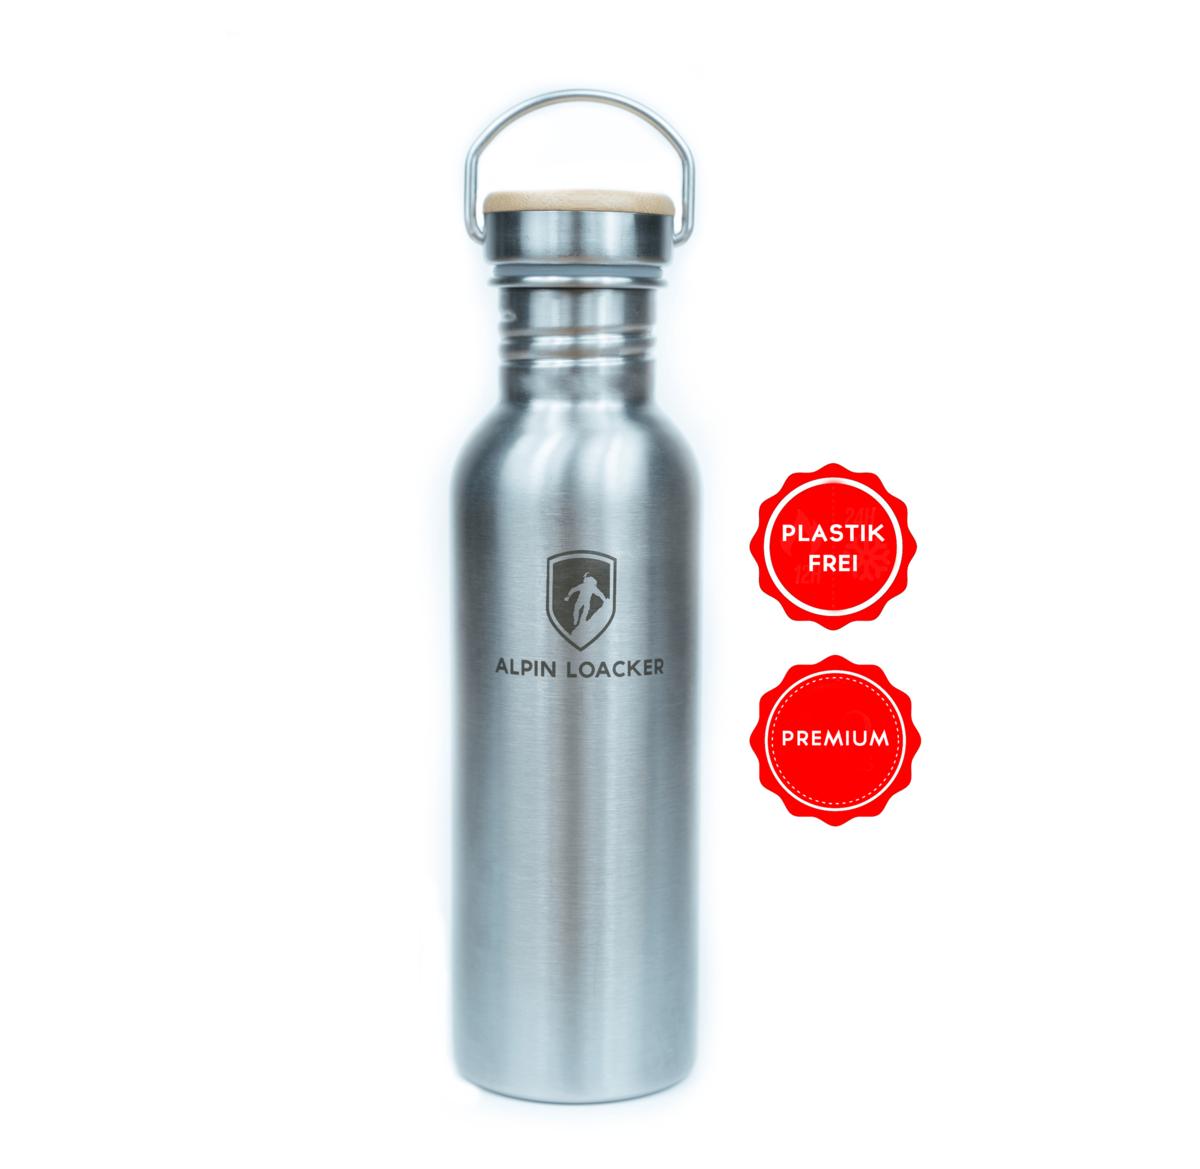 Hyperpage Edelstahl Trinkflasche